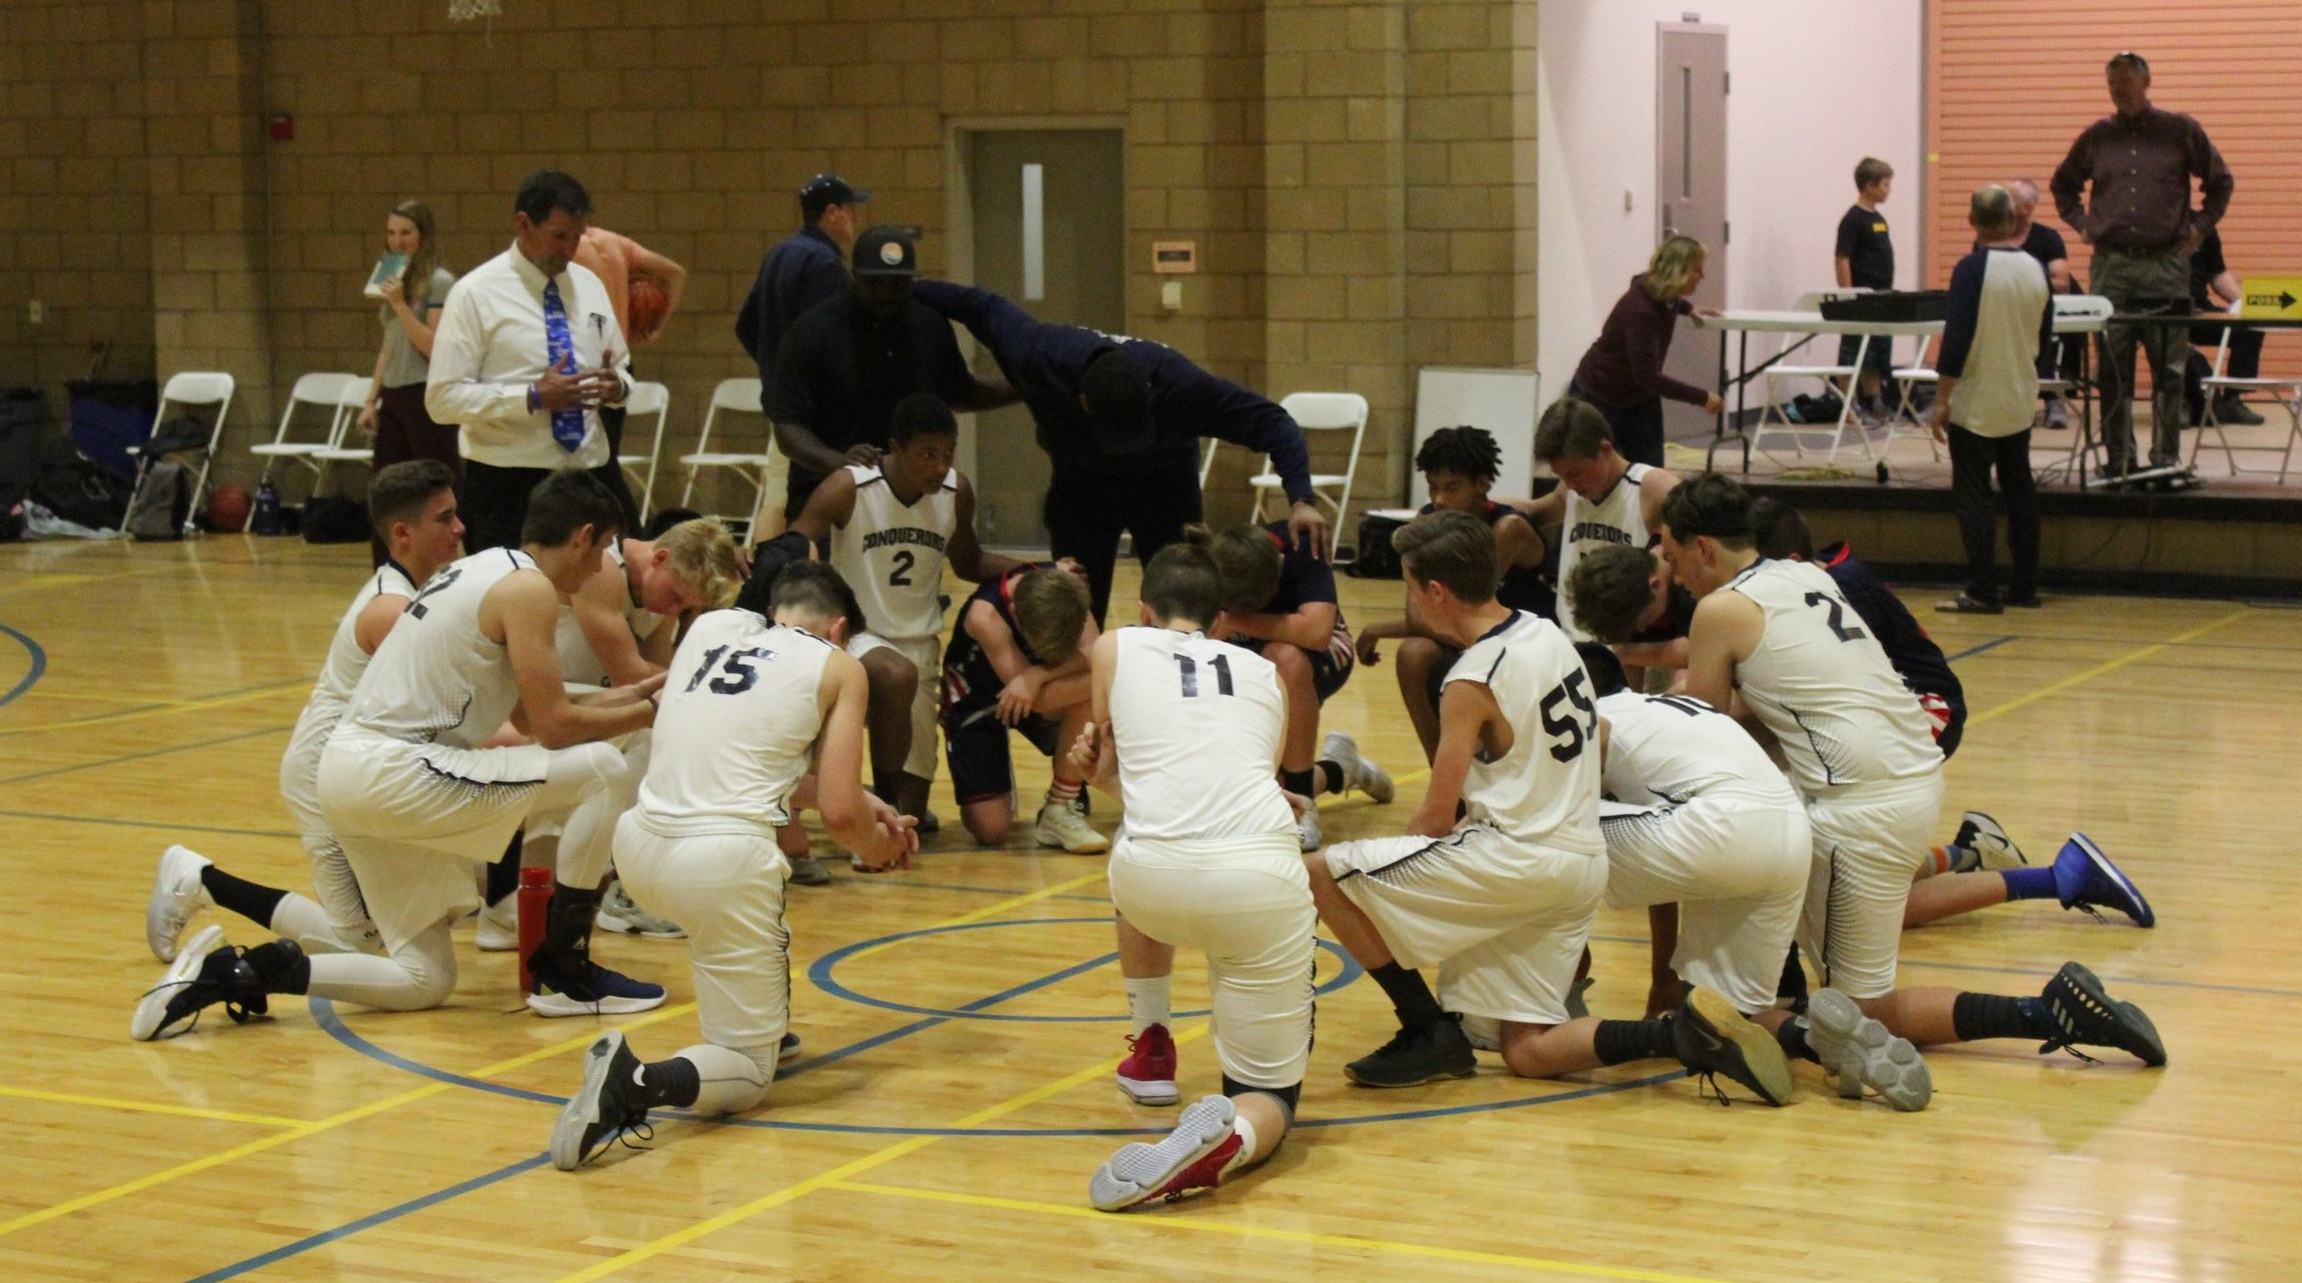 Basketball Team Huddles